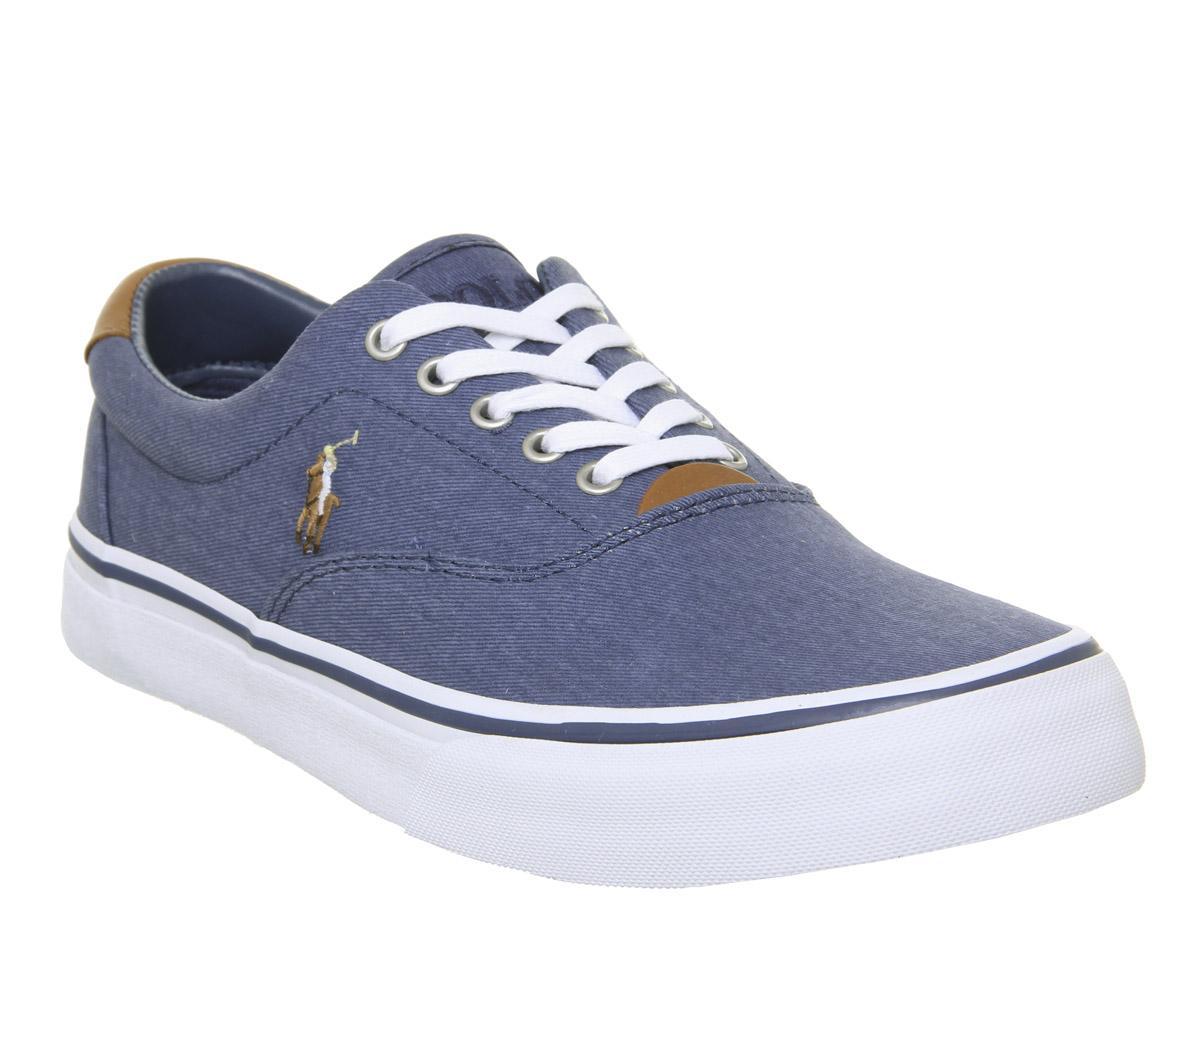 Thornton Sneakers